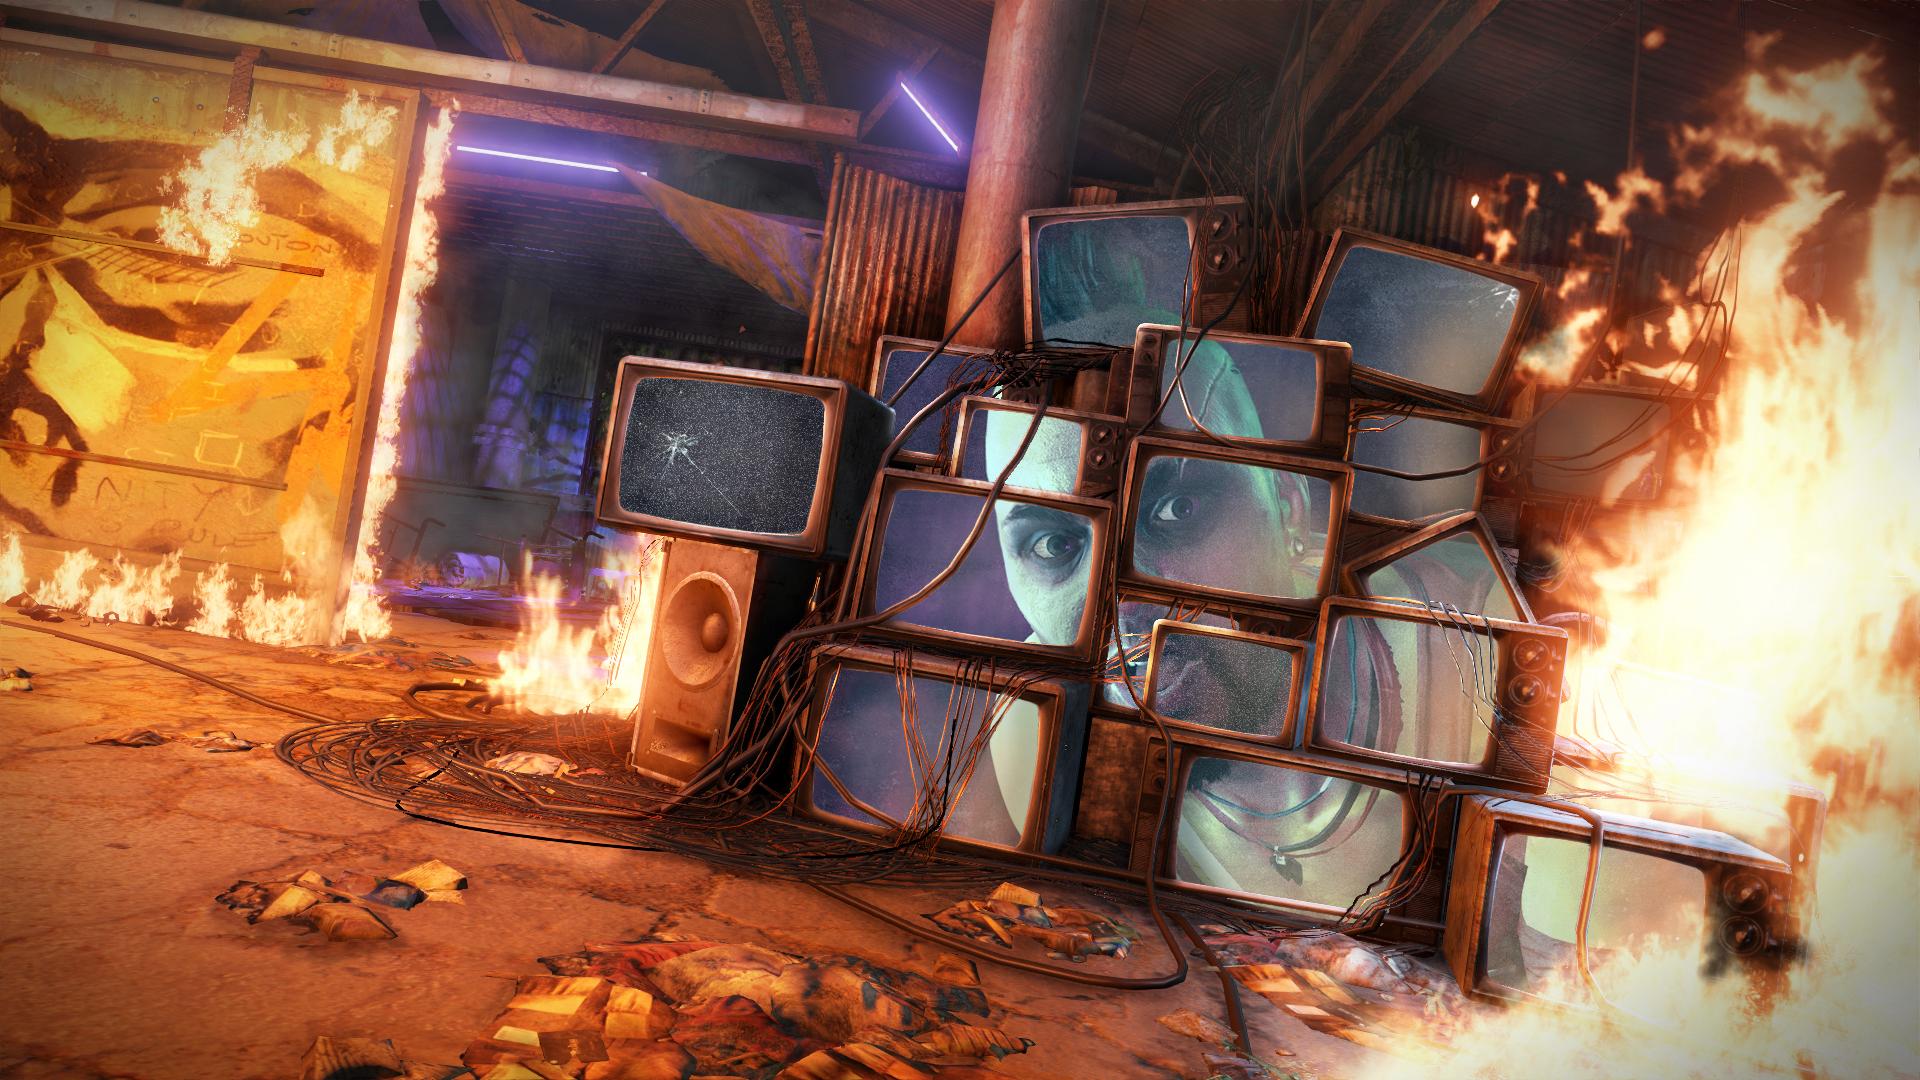 Far Cry 3 Wallpaper Vaas Tv2 The Jester S Corner